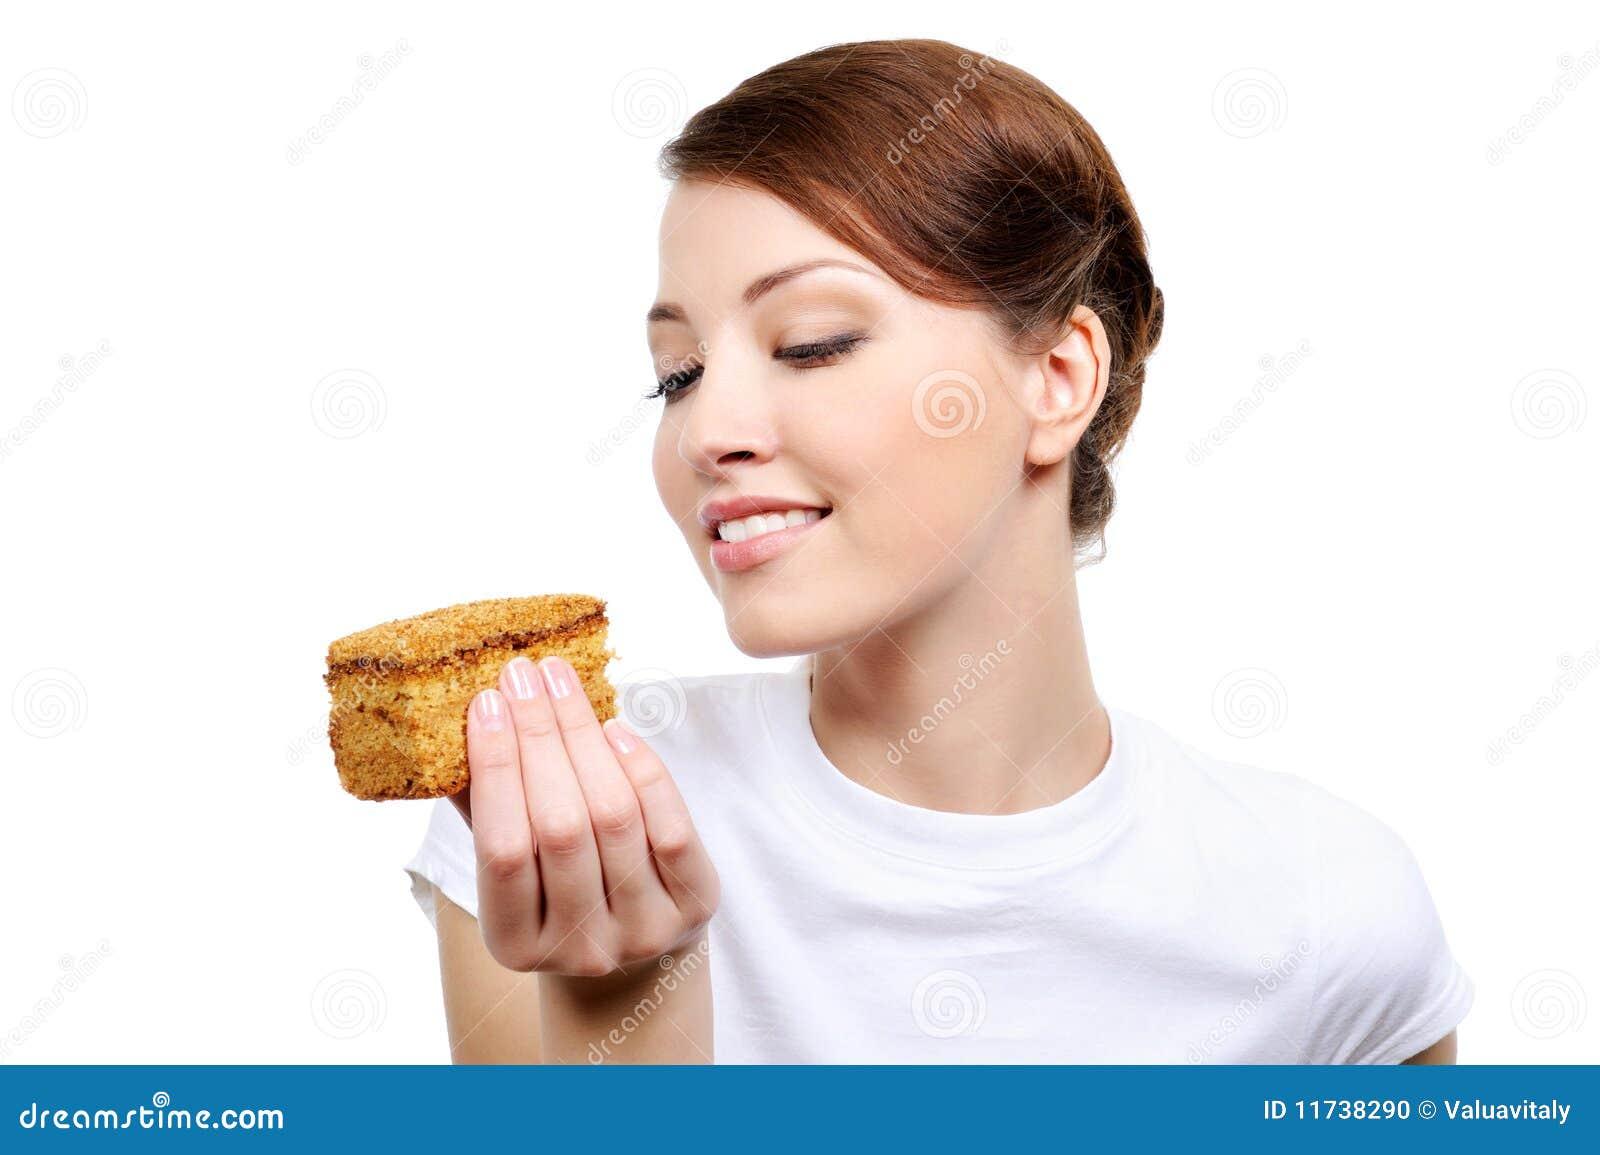 Fat Woman Eating Food